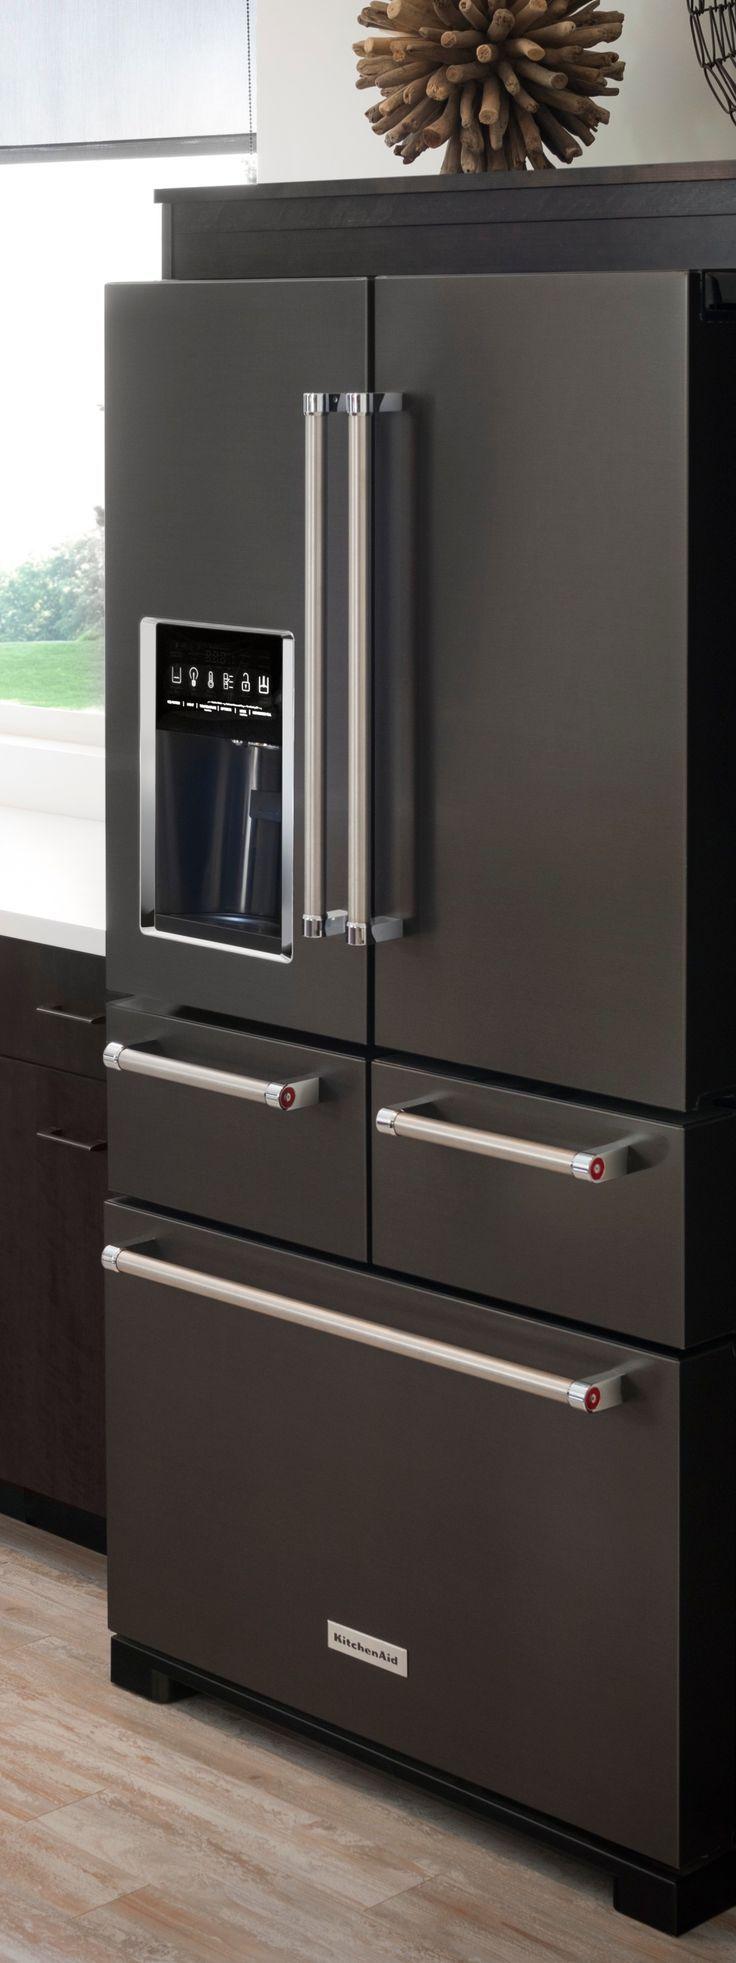 Best 25+ Kitchenaid refrigerator ideas on Pinterest